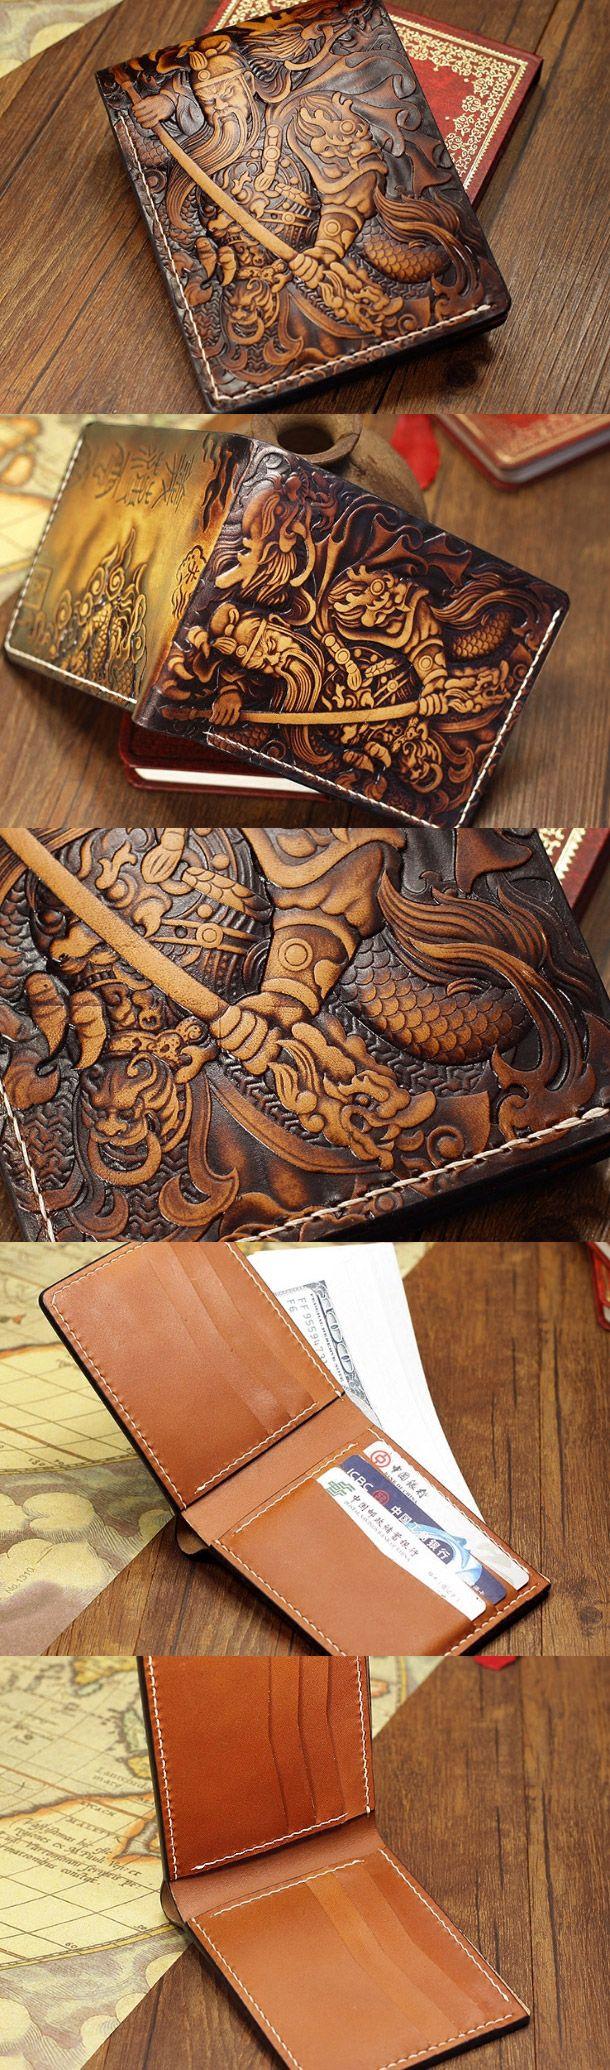 Handmade the-Three-Kingdoms_Guan-Yu carved leather custom